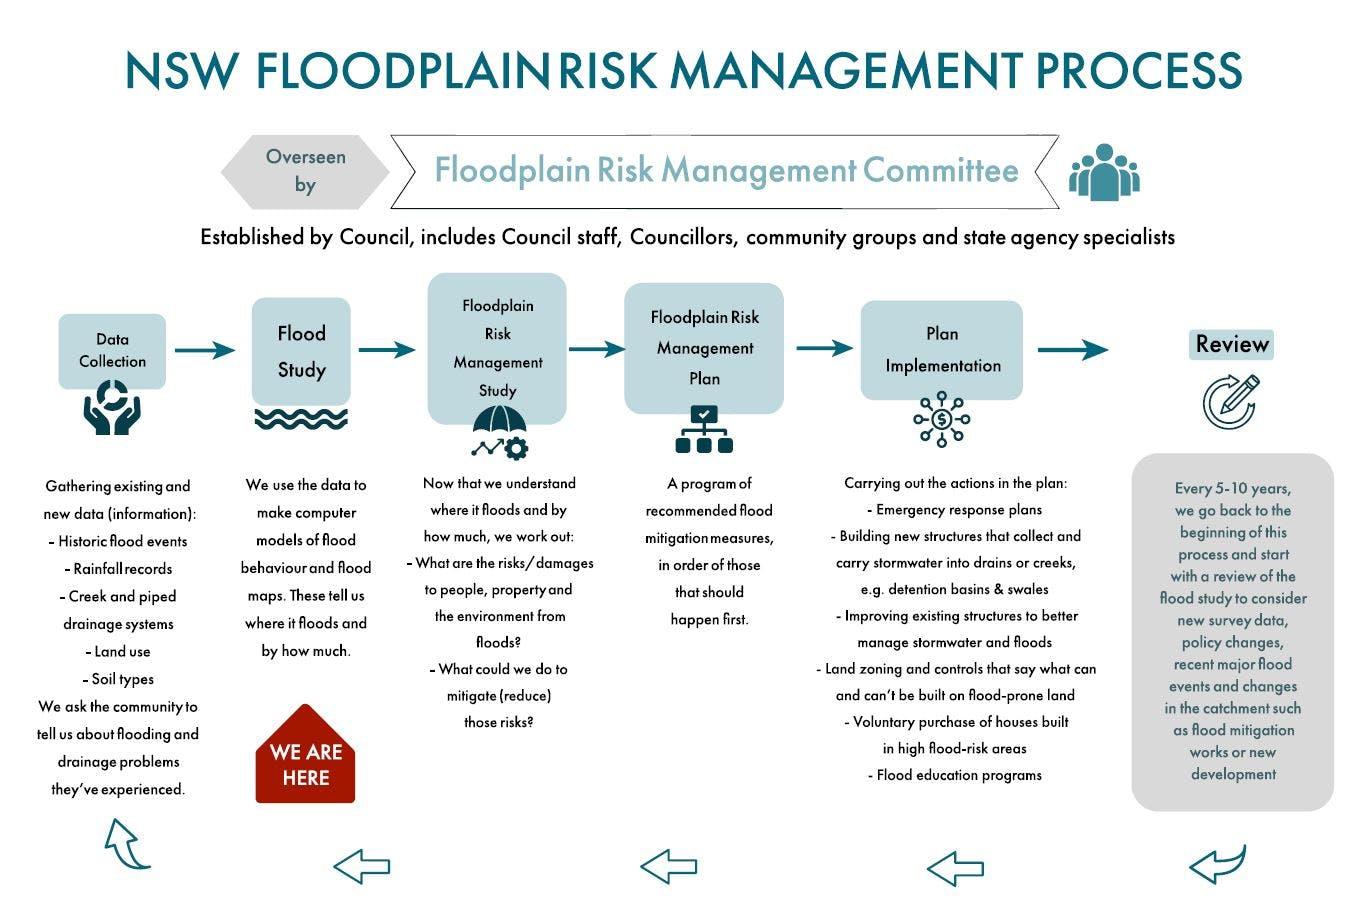 NSW Floodplain Risk Managemement Process